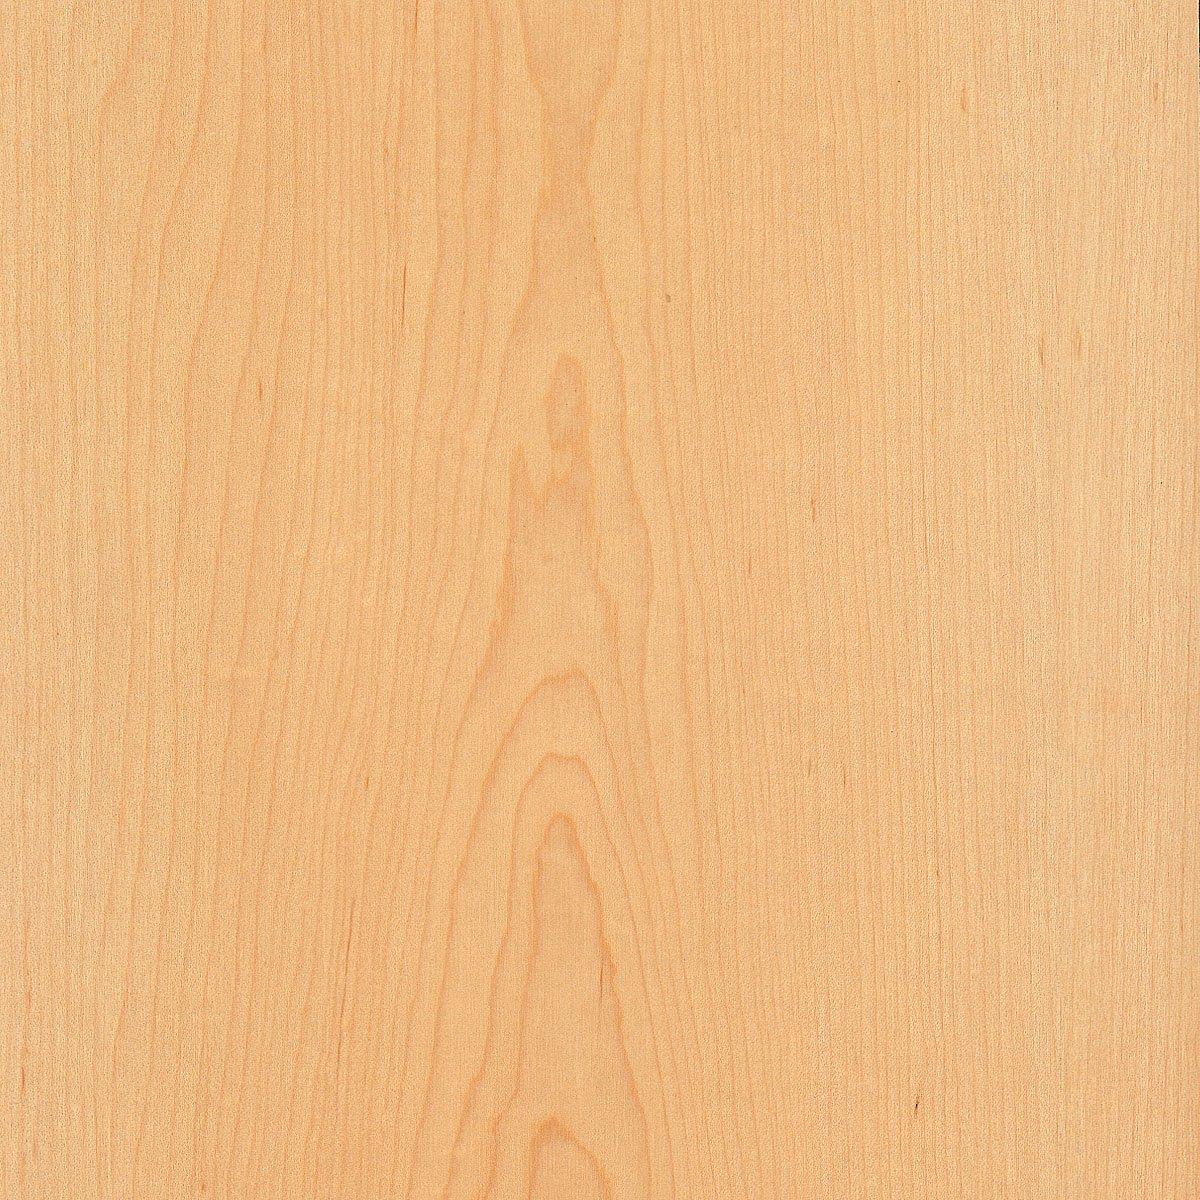 Maple Wood Veneer Plain Sliced 2'x8' PSA 9505(Peel and Stick) Natural Finish Sheet